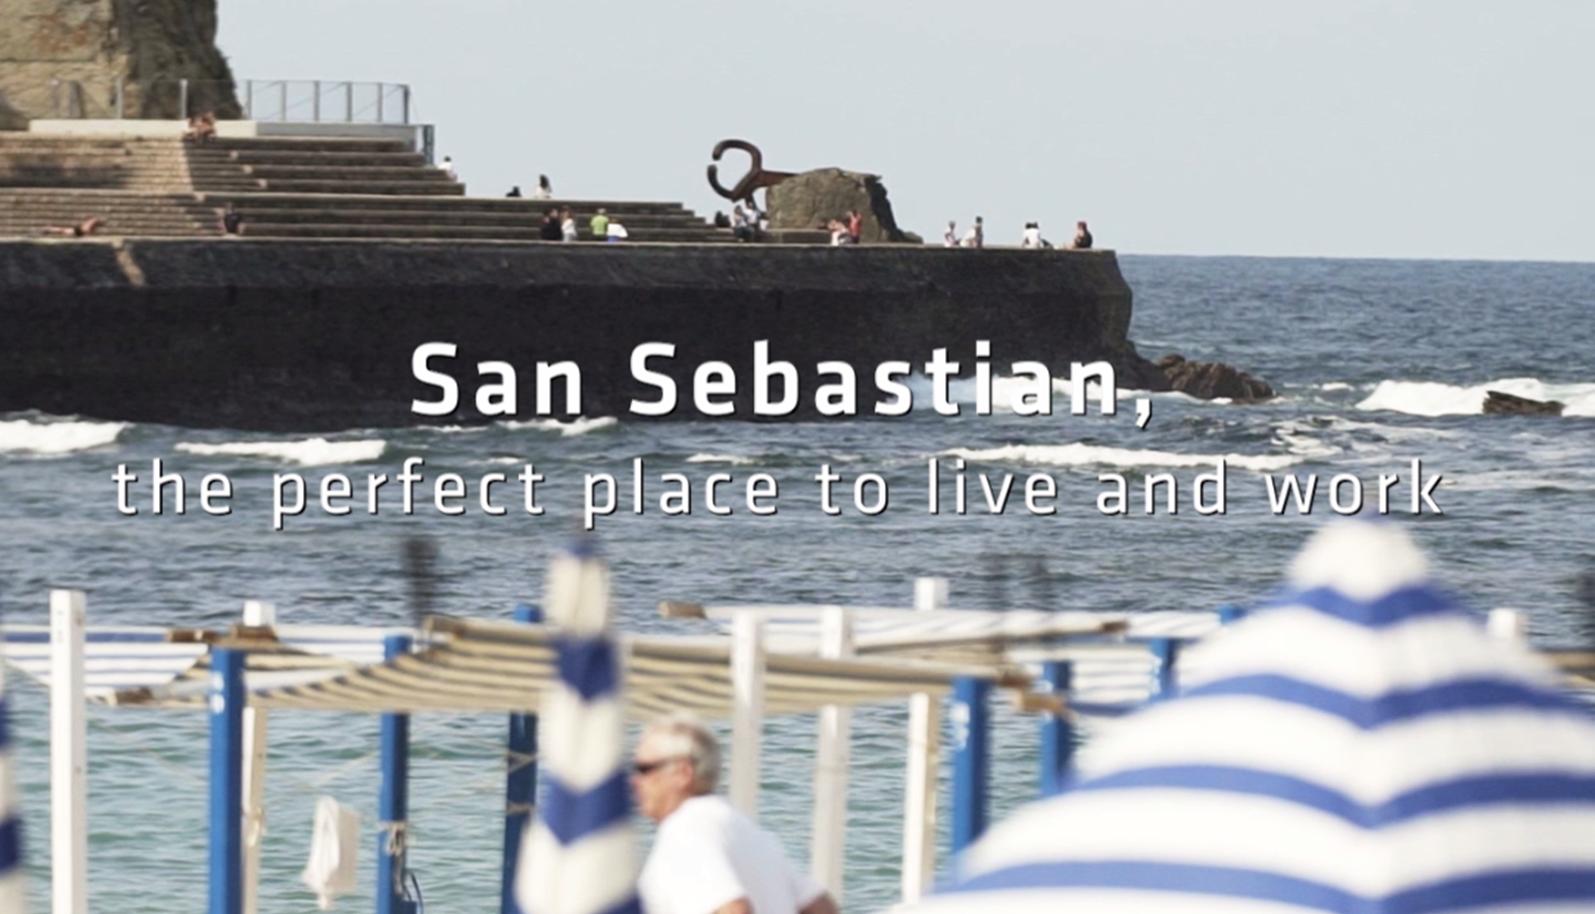 San Sebastian video 2018 thumbnail